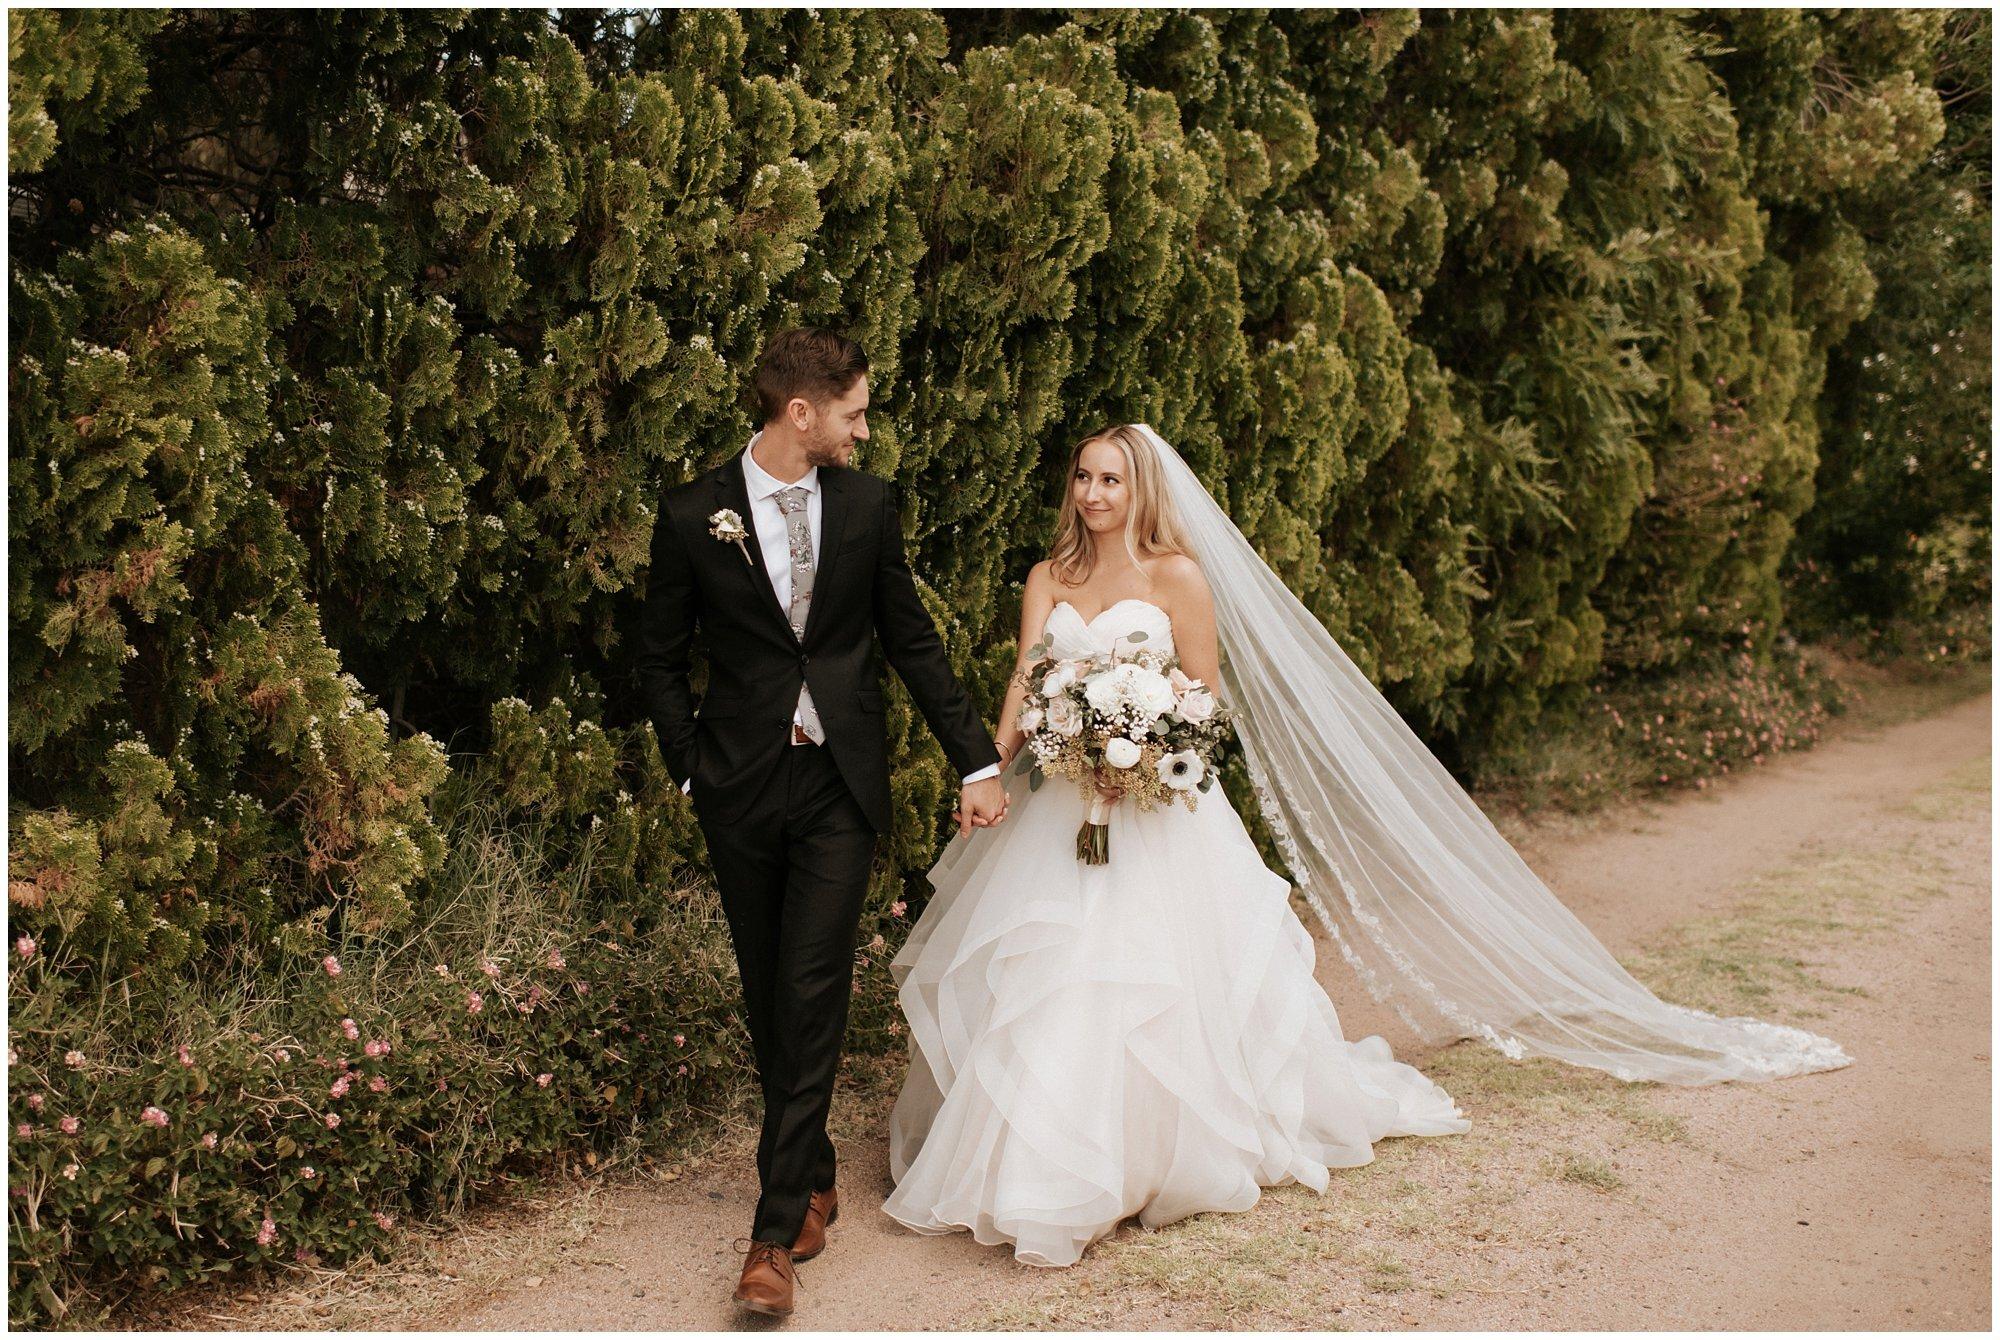 Wedgewood_Lindsay_Groves-Arizona-Wedding-Photographer-M+C_0057.jpg